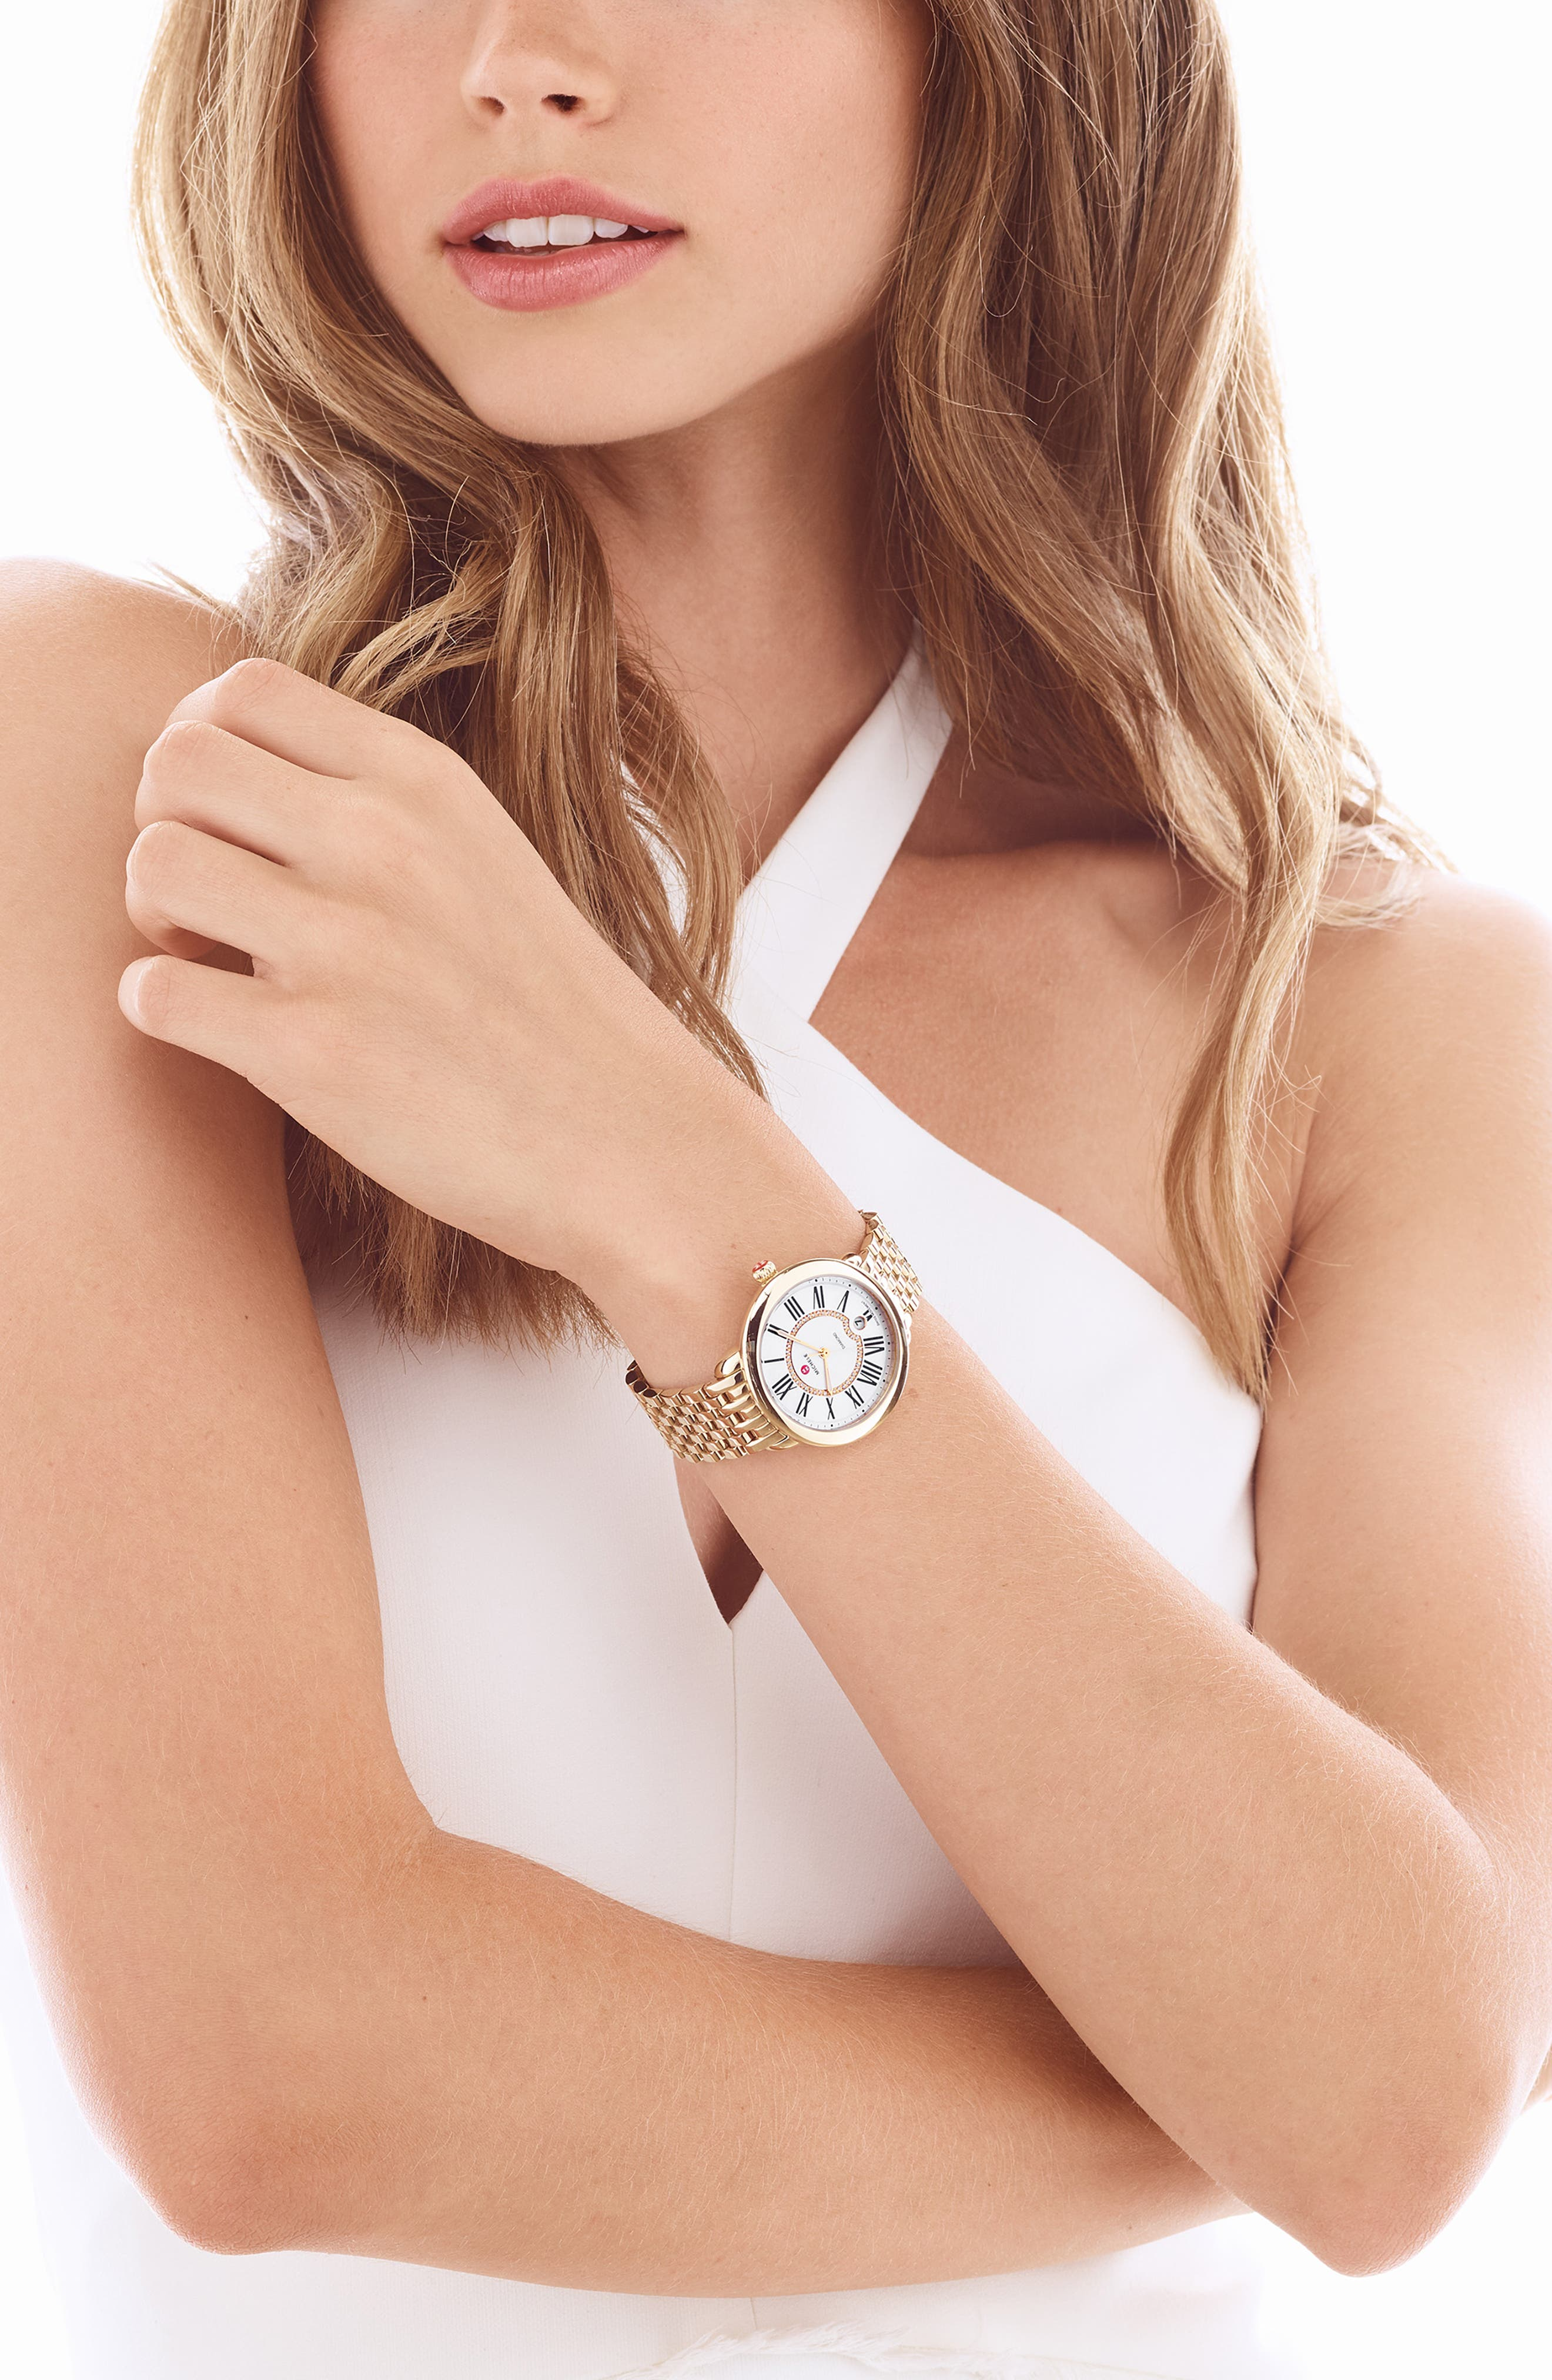 Serein 16mm Gold Plated Bracelet Watchband,                             Alternate thumbnail 2, color,                             Gold